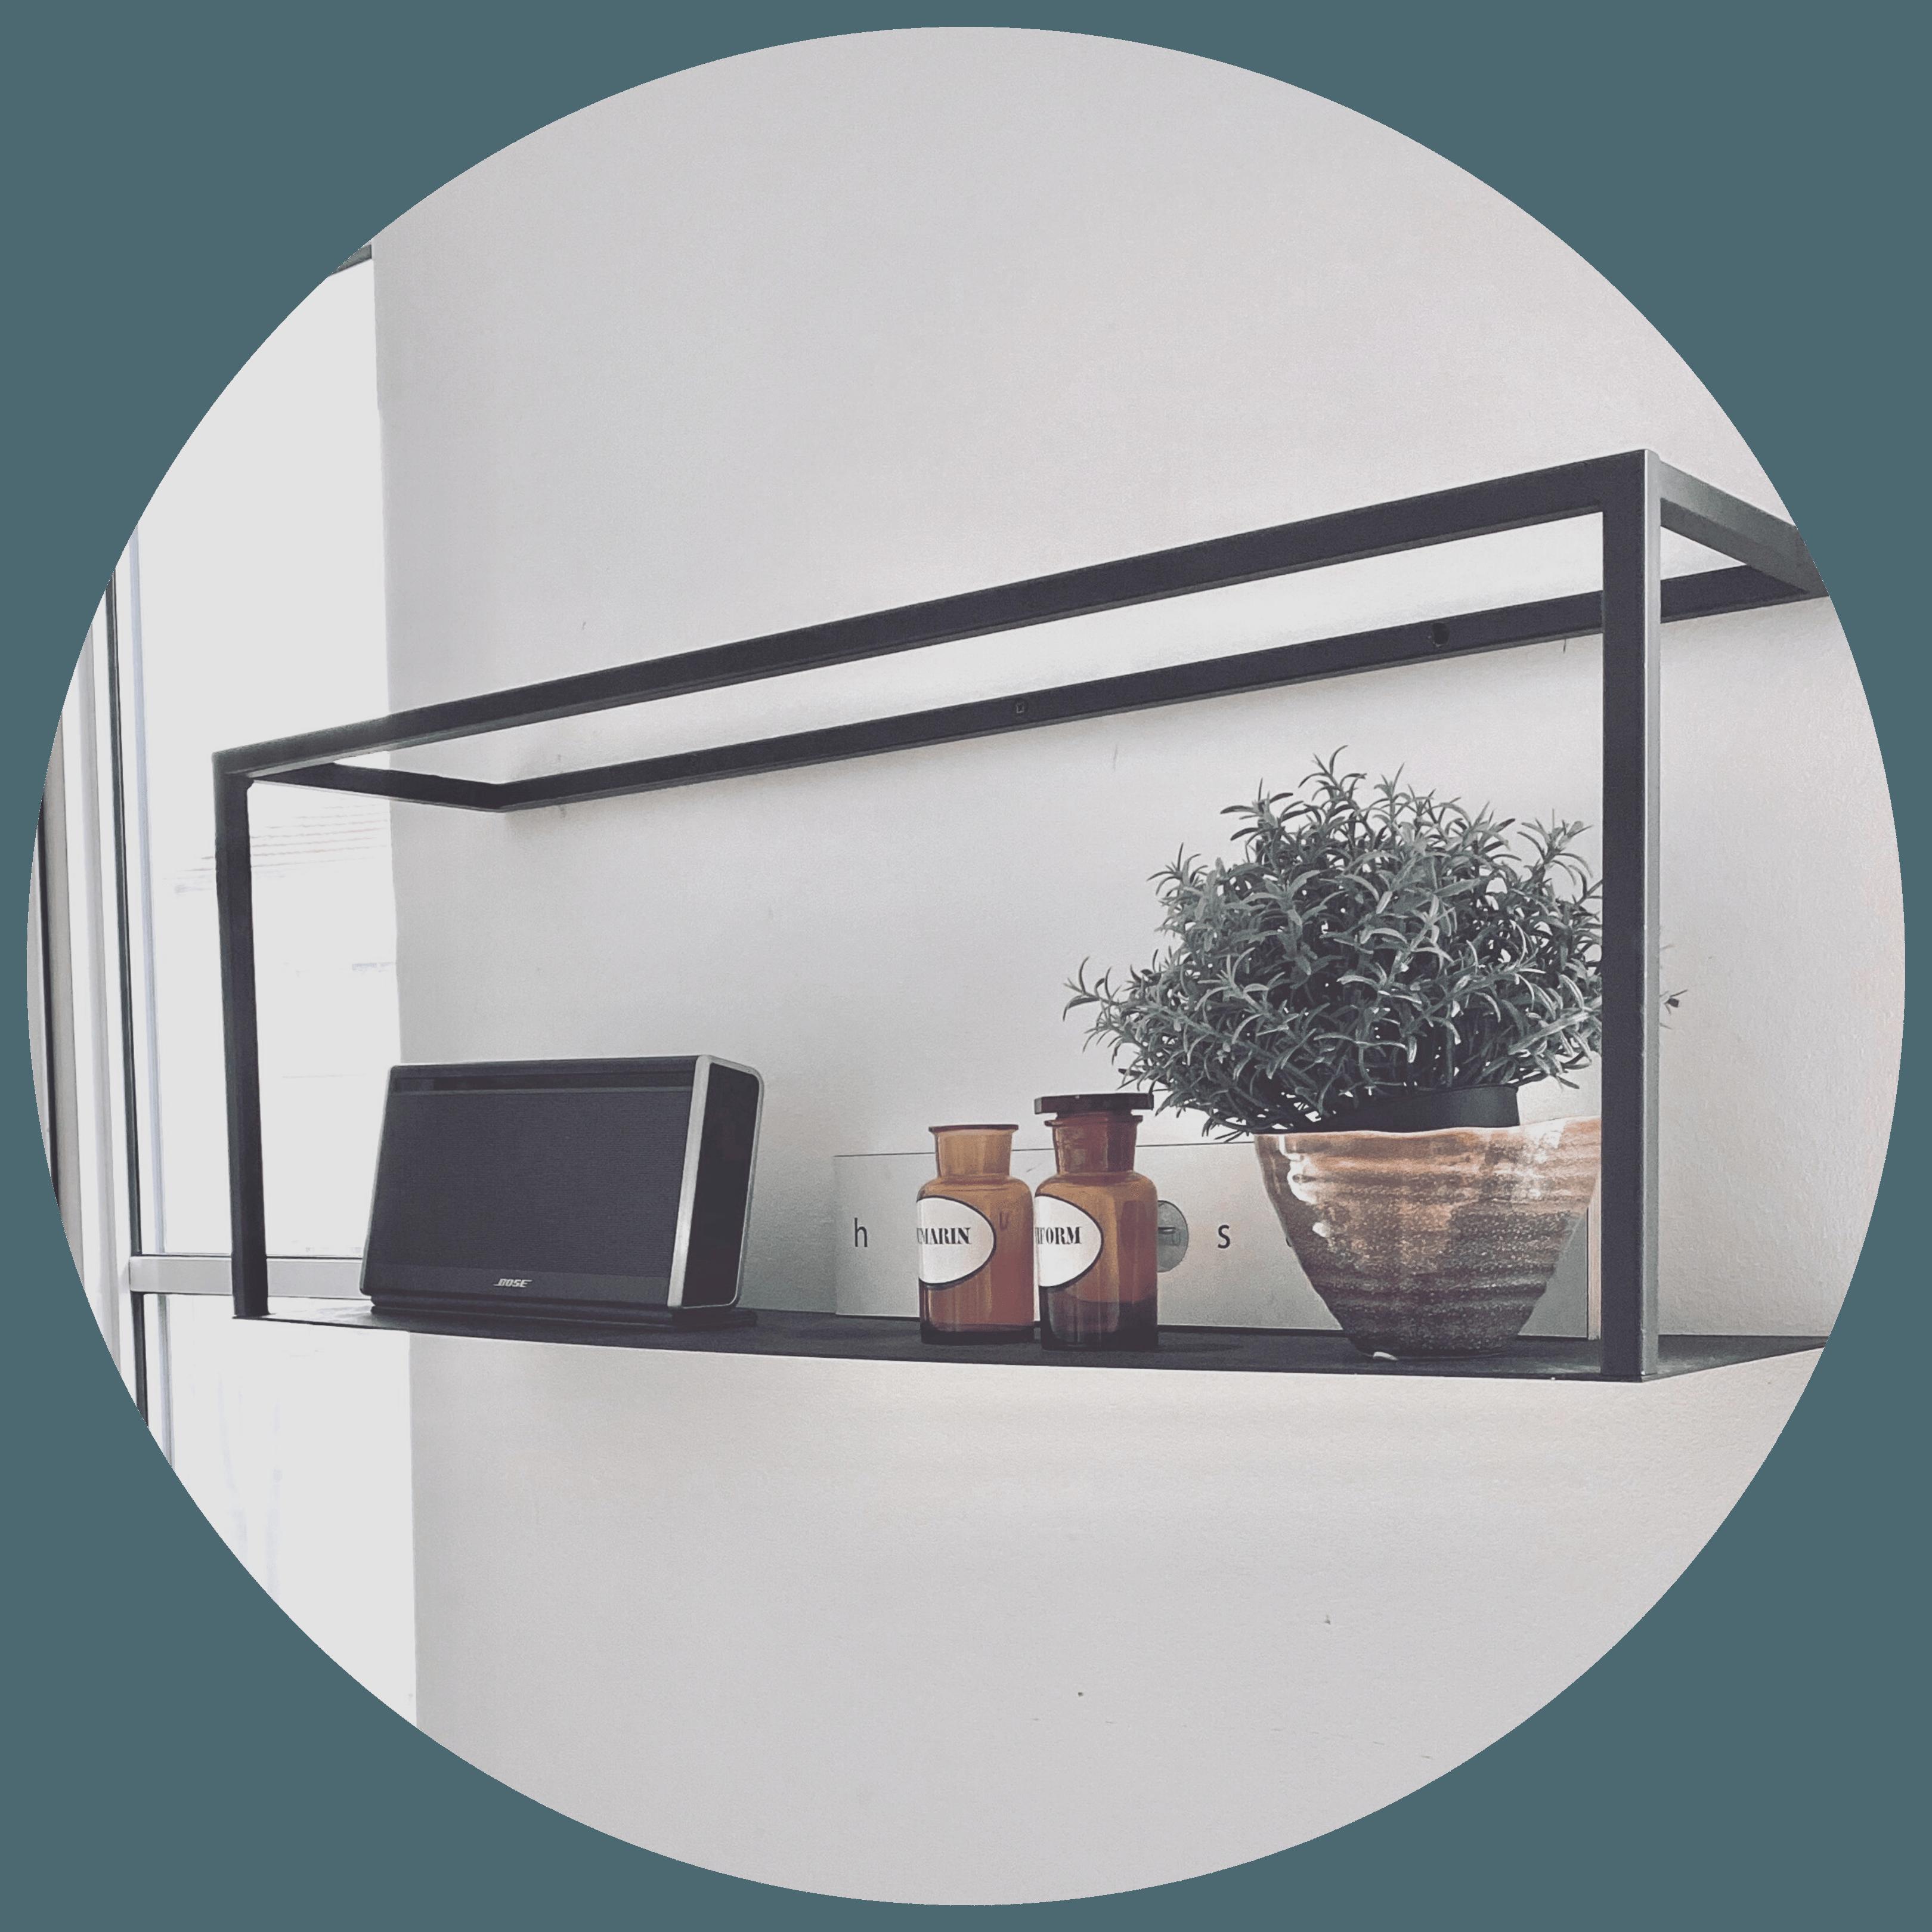 schweissenlernen Koeln 10 - DIY WORKSHOPS